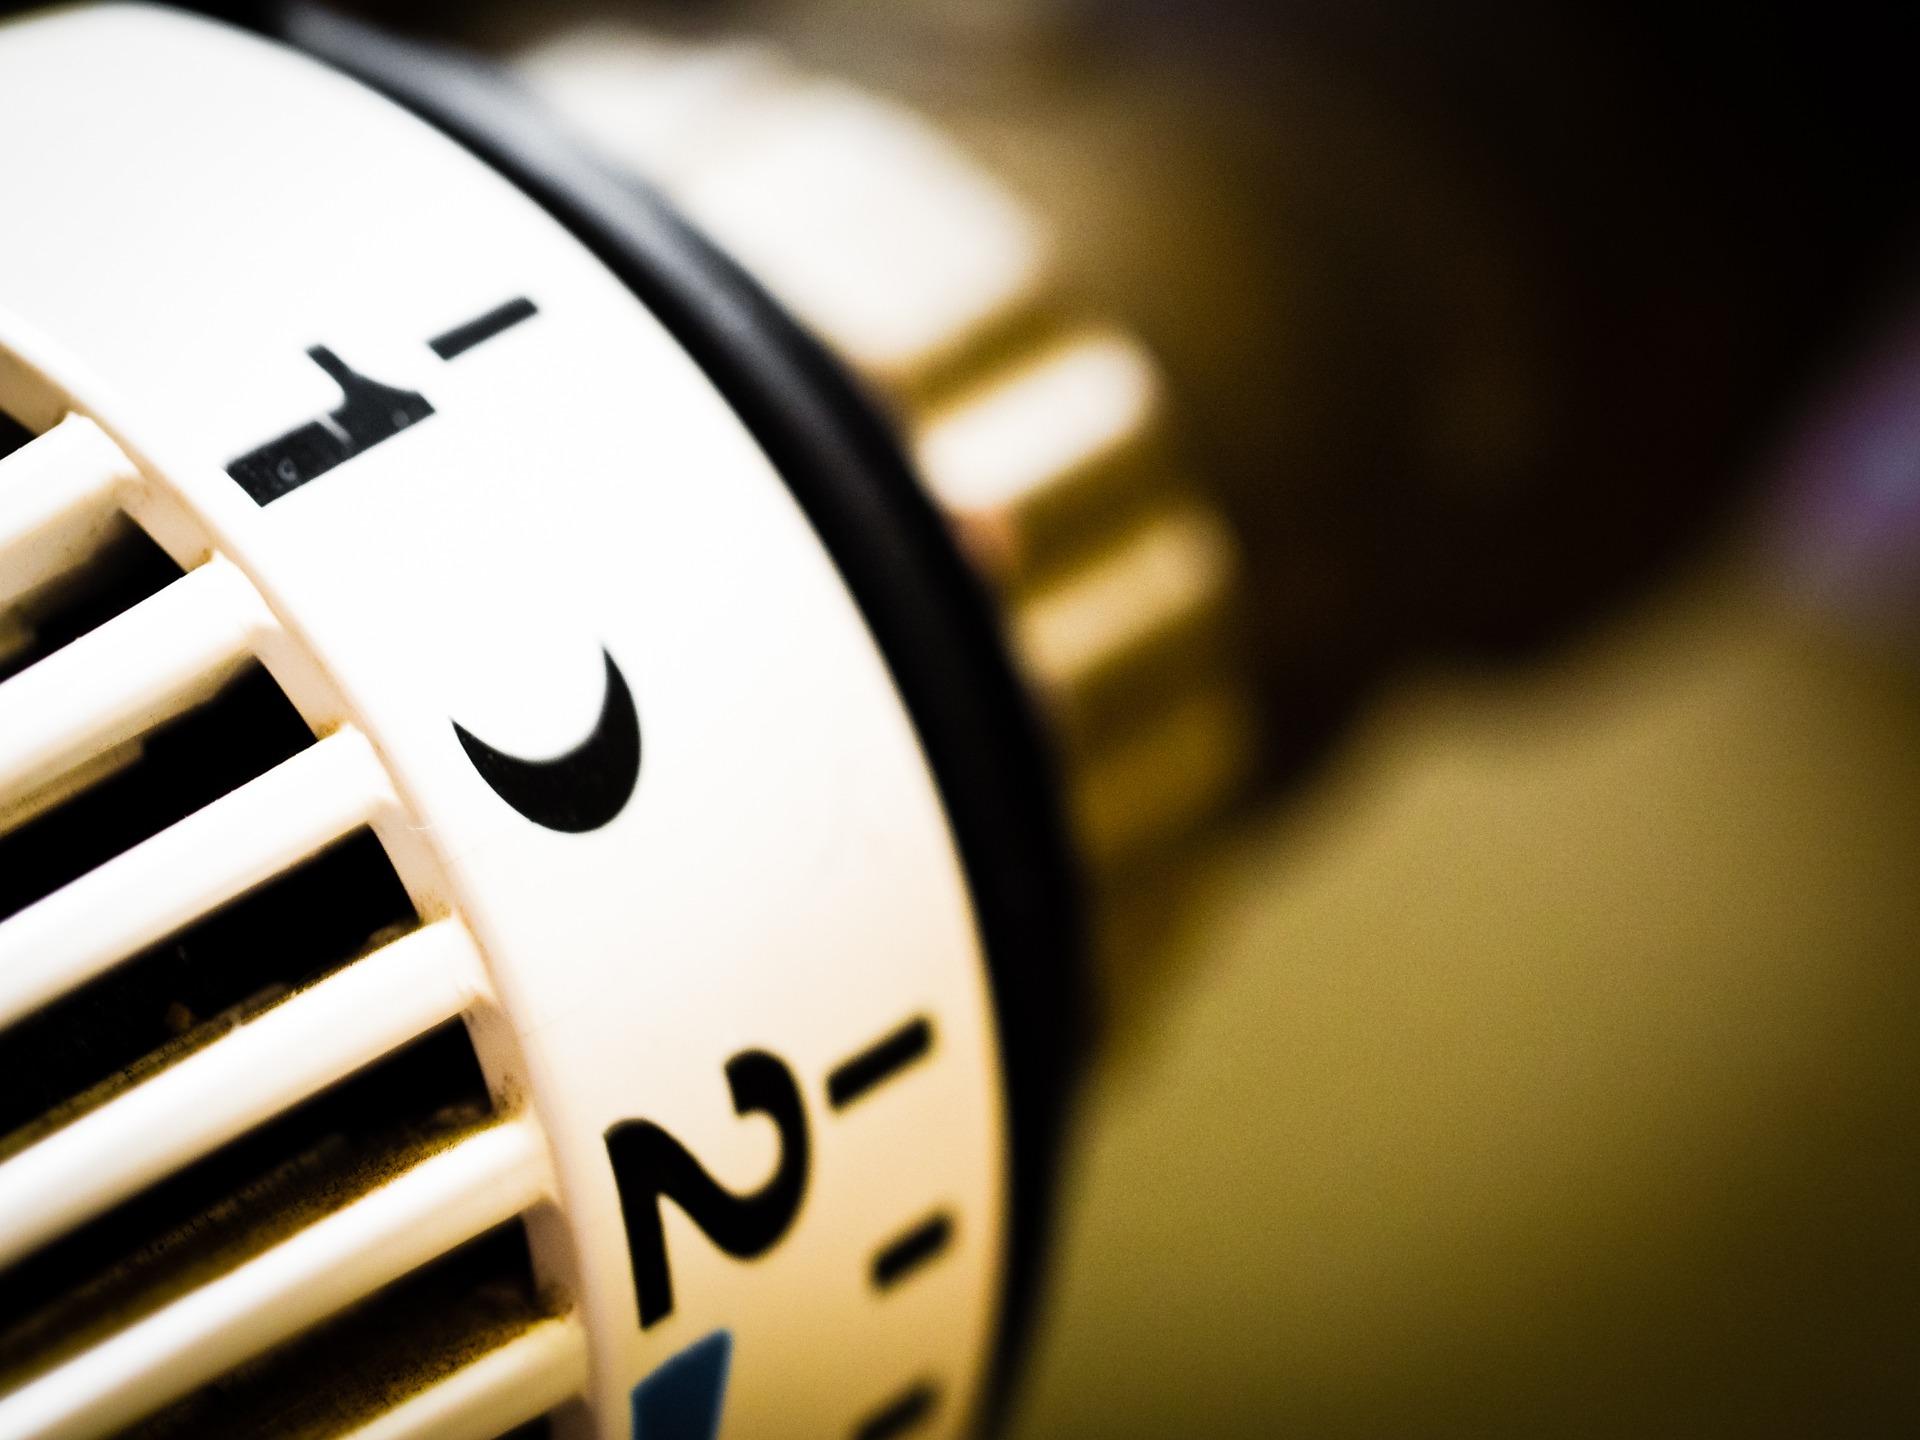 radiateur-chauffage